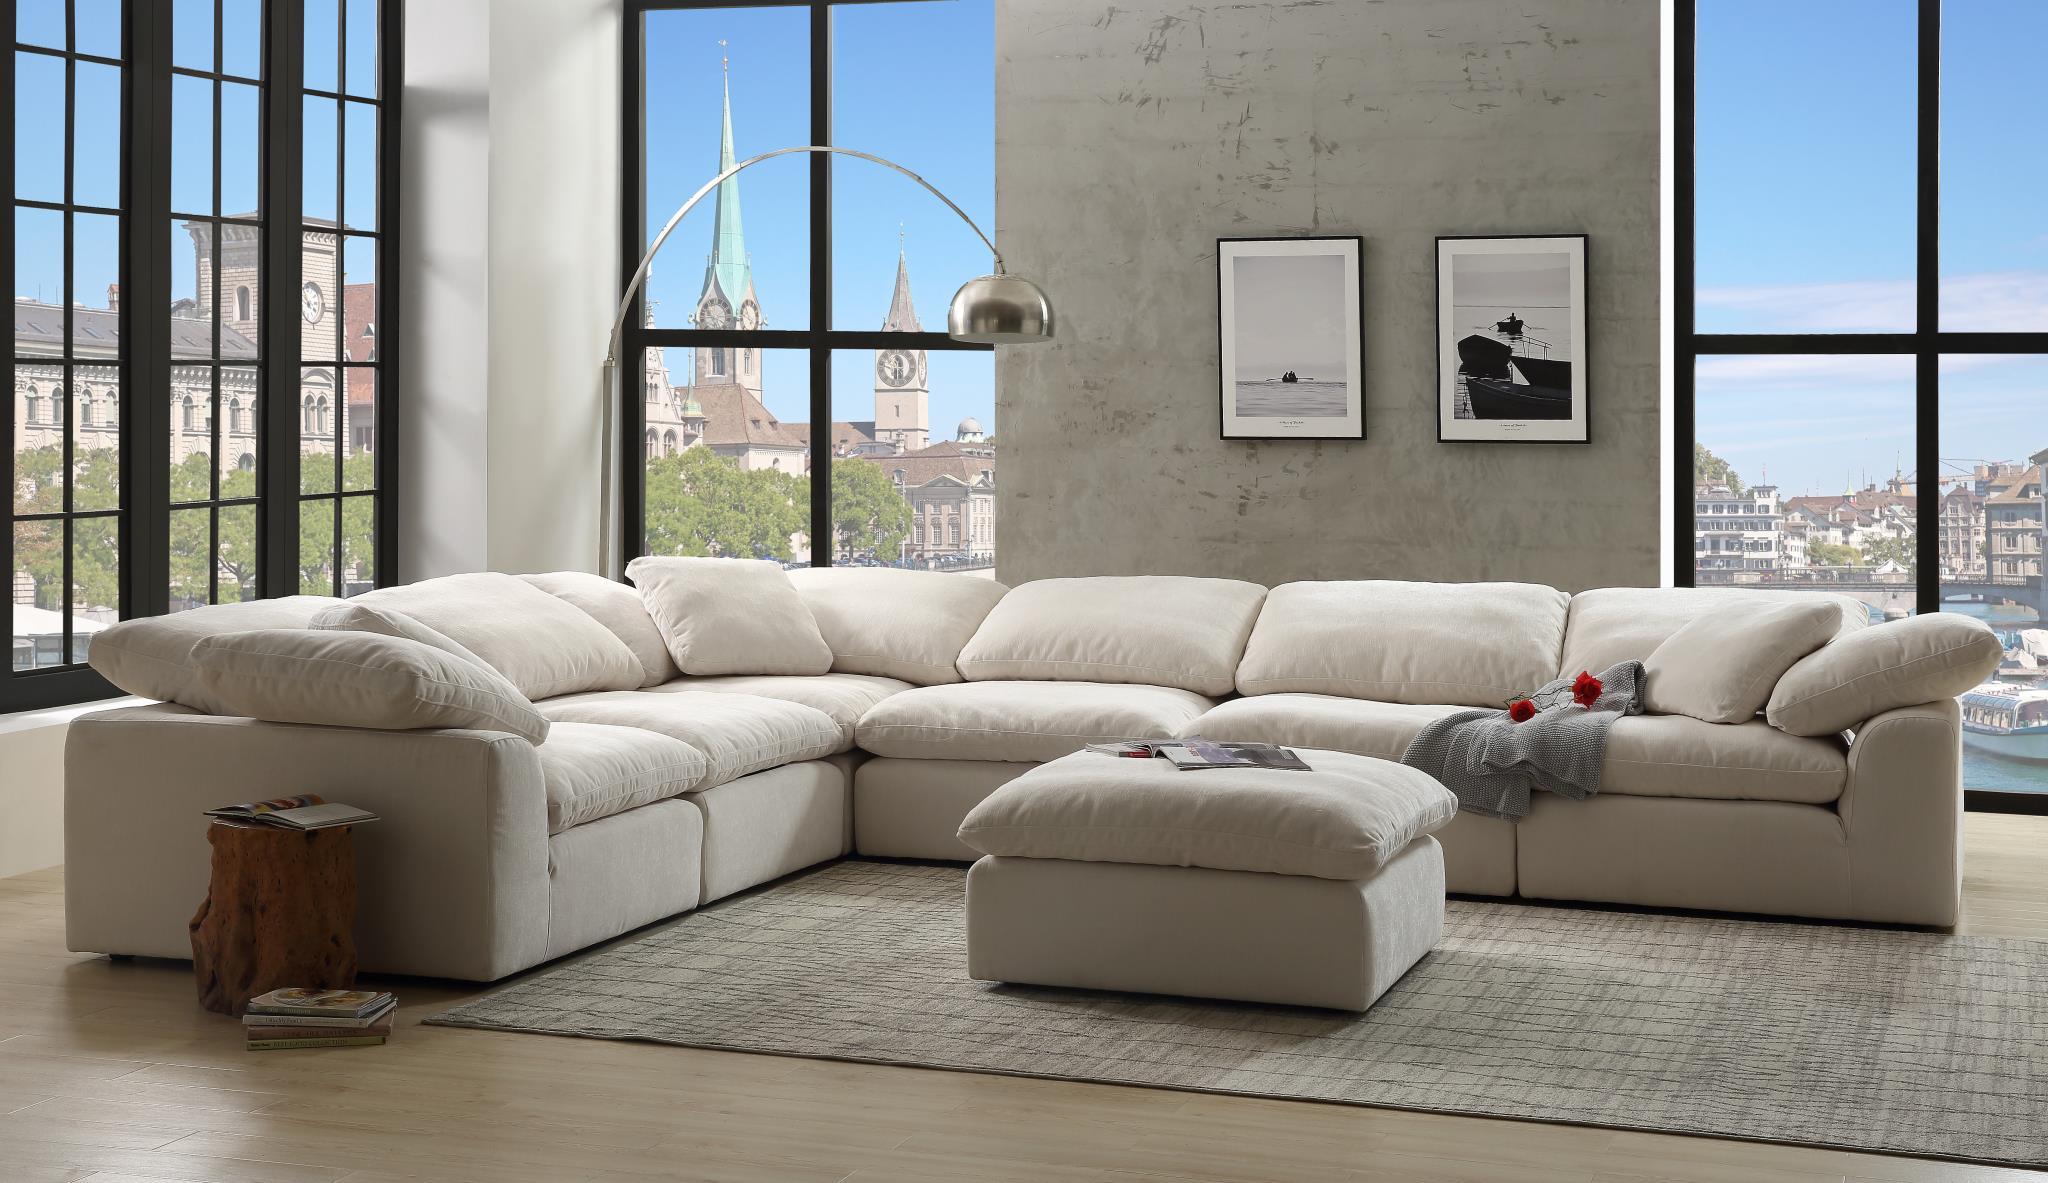 naveen contemporary modular sectional sofa with ottoman